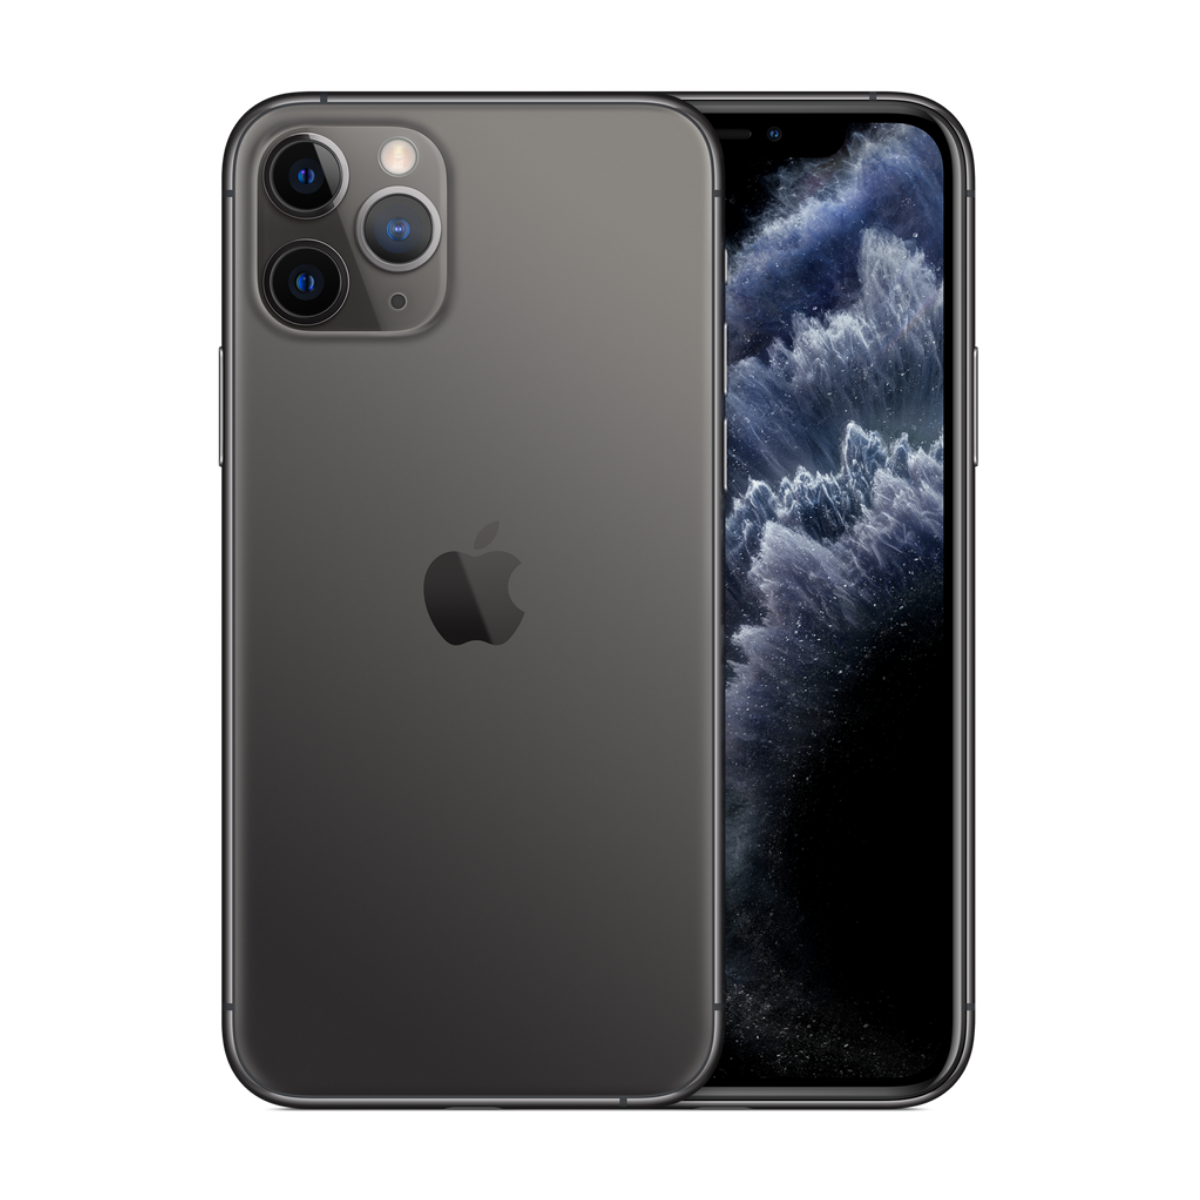 Sim Free iPhone 11 Pro 64GB Unlocked Mobile Phone